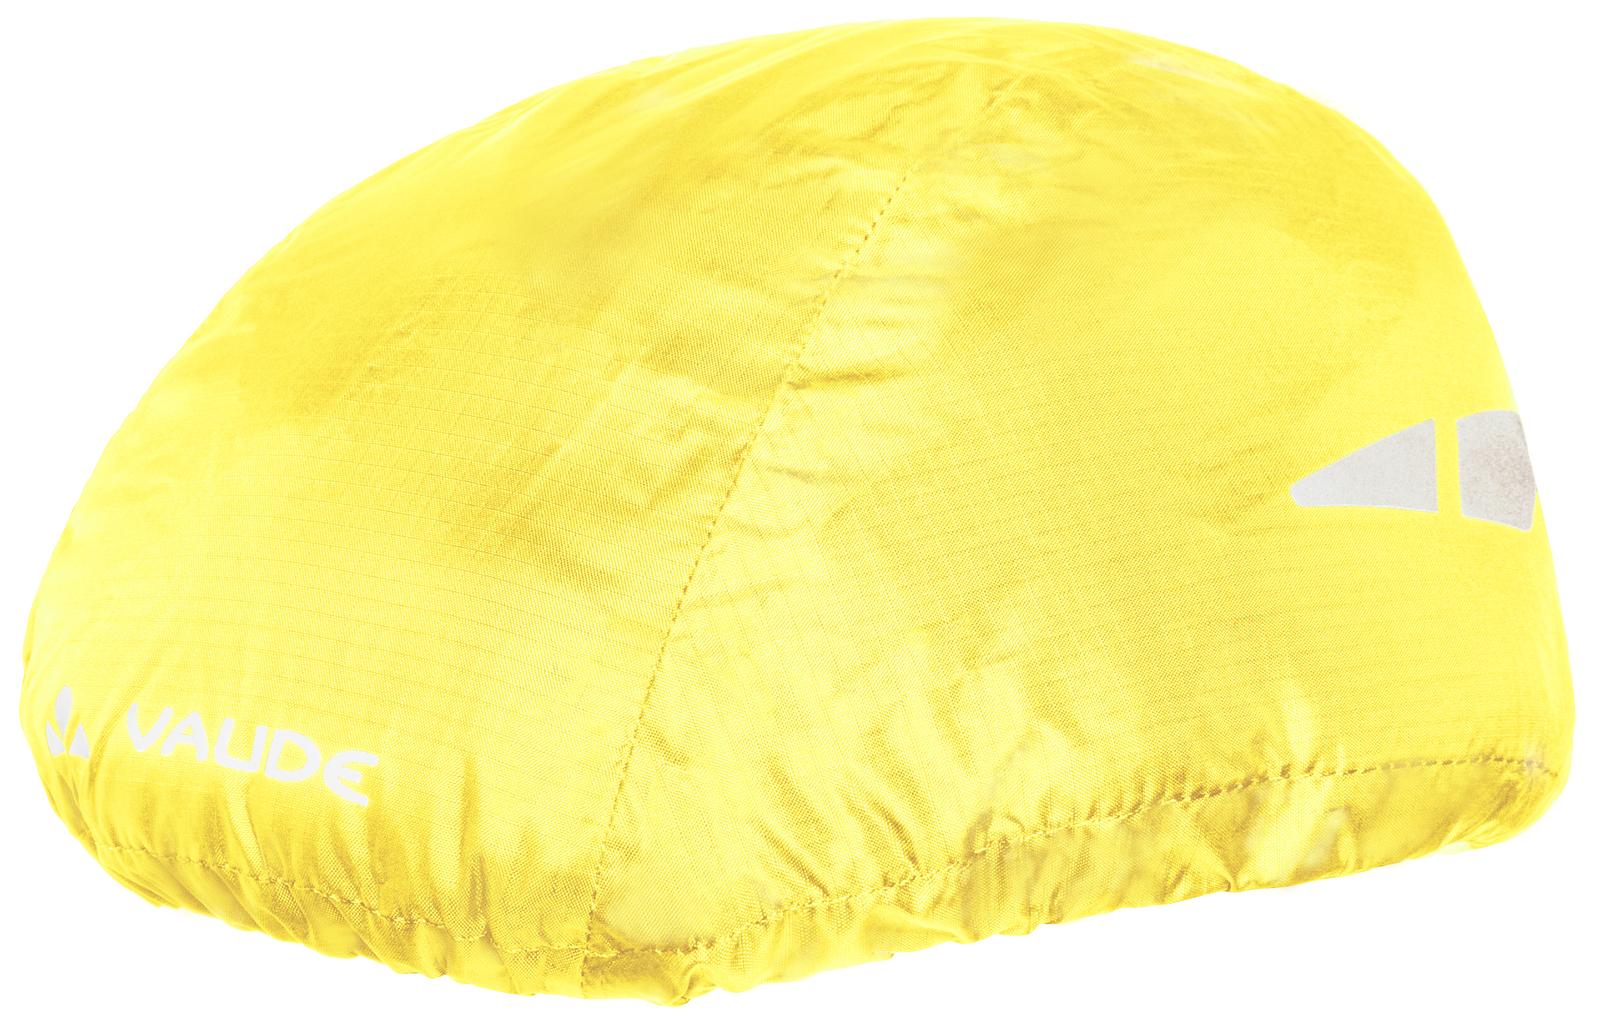 VAUDE Helmet Raincover neon yellow  - Total Normal Bikes - Onlineshop und E-Bike Fahrradgeschäft in St.Ingbert im Saarland